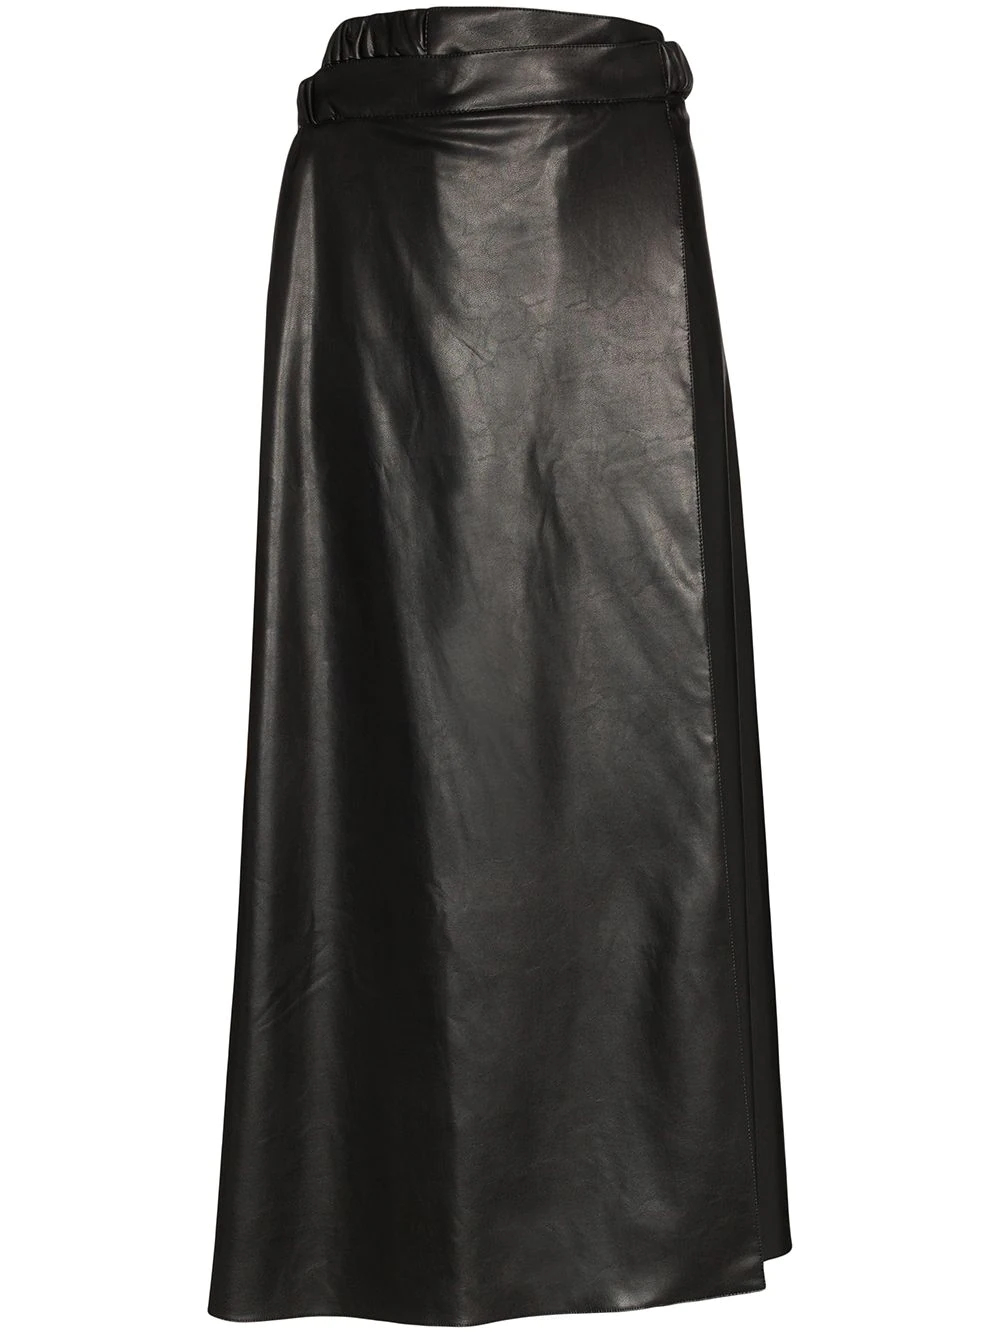 MARKOO | MARKOO юбка А-силуэта из искусственной кожи | Clouty